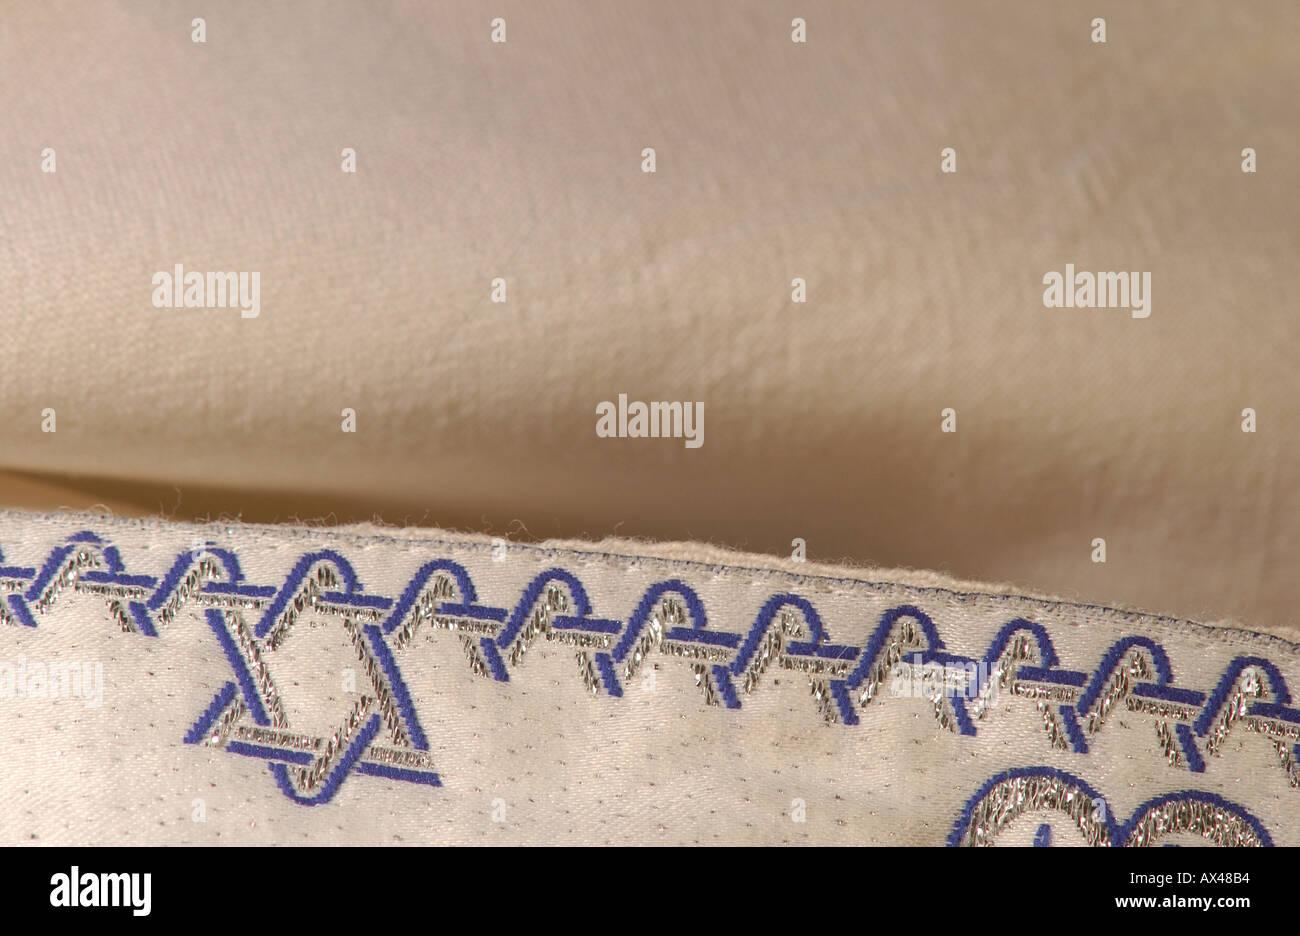 Judaica Symbols Prayer Shawl - Stock Image